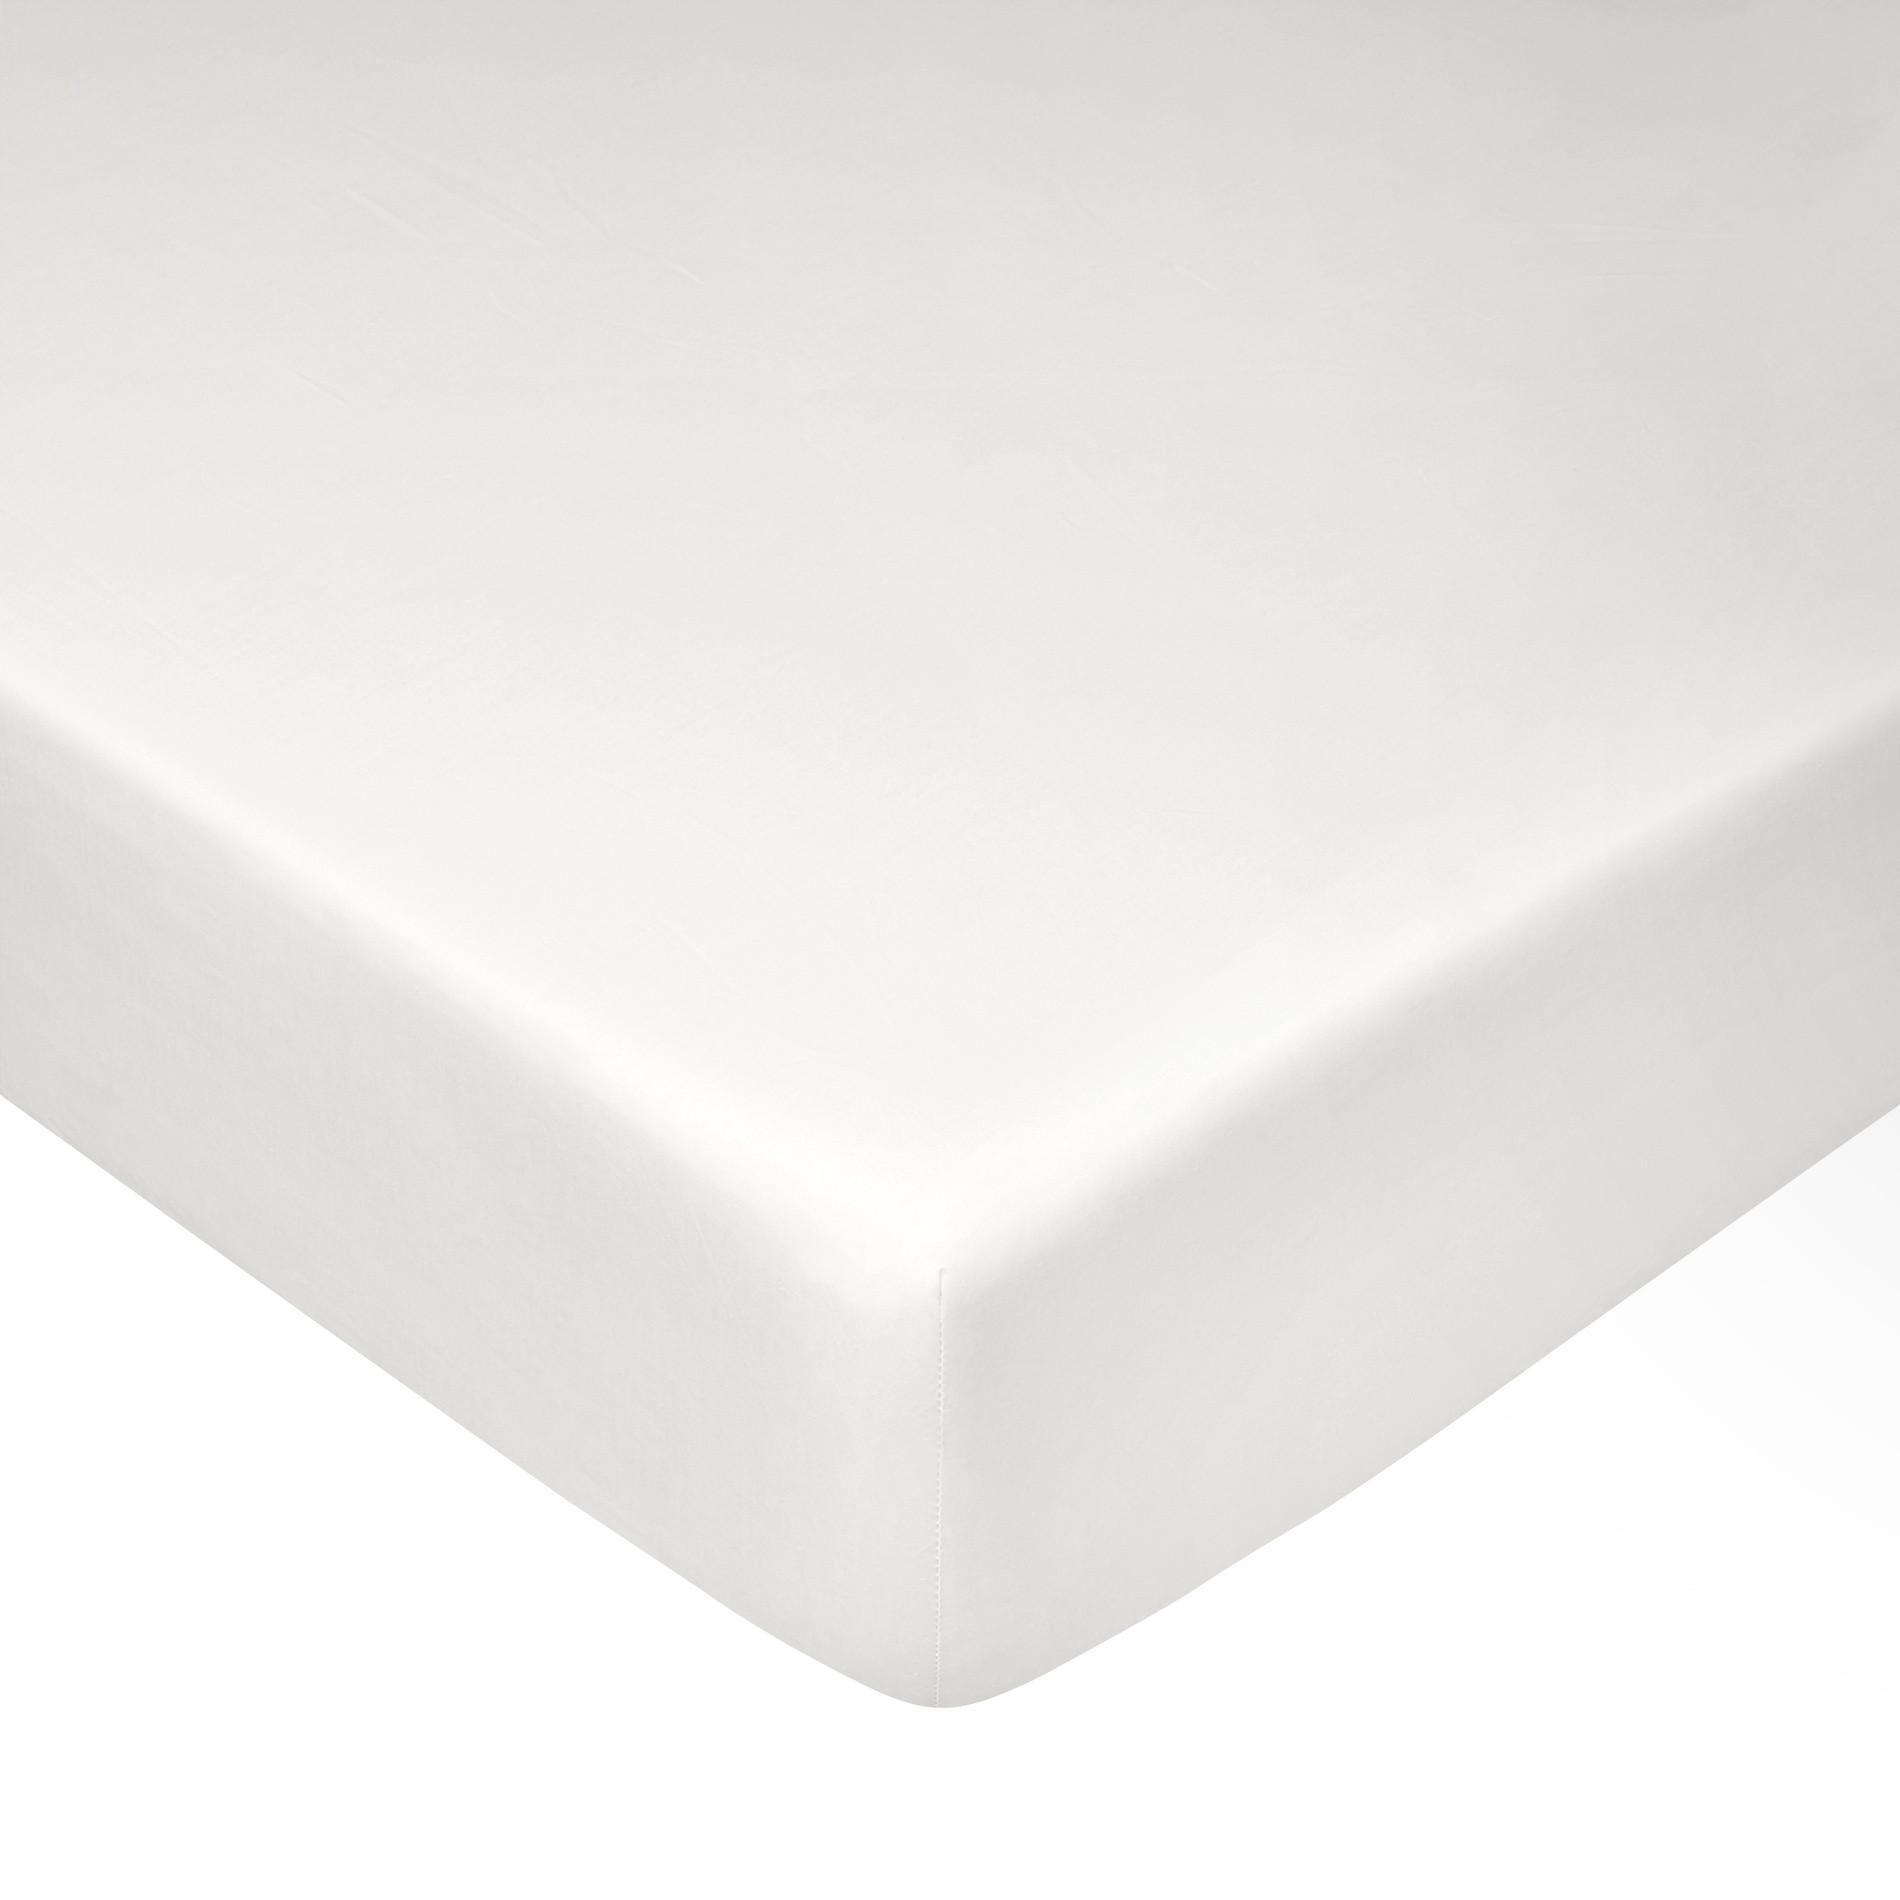 Lenzuolo con angoli in percalle tinta unita Zefiro, Bianco, large image number 0